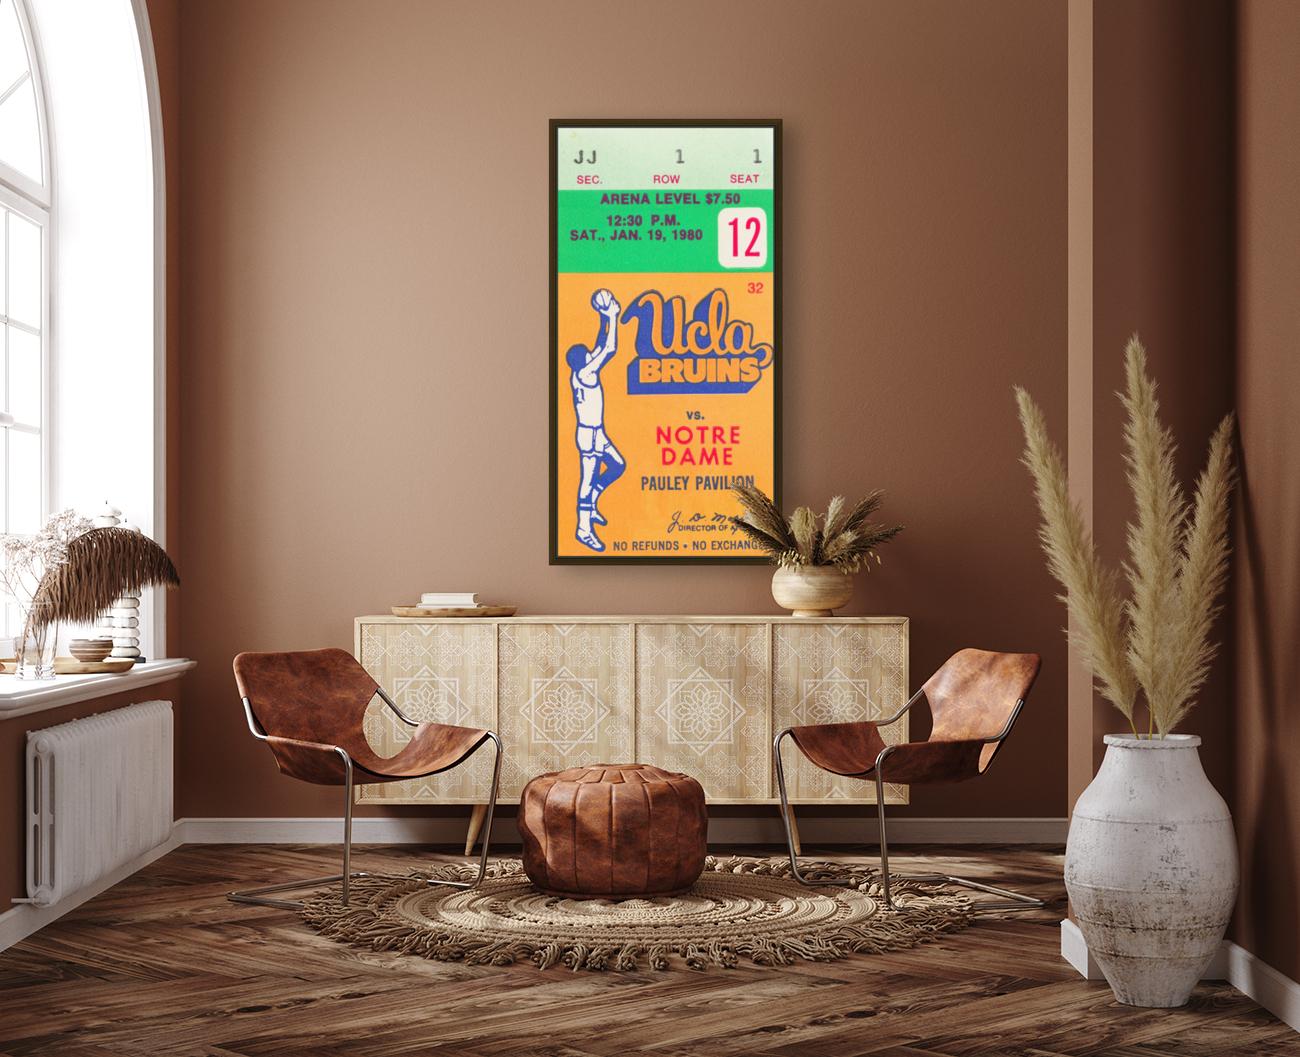 1980 UCLA Bruins Basketball Ticket Stub  Art  Art